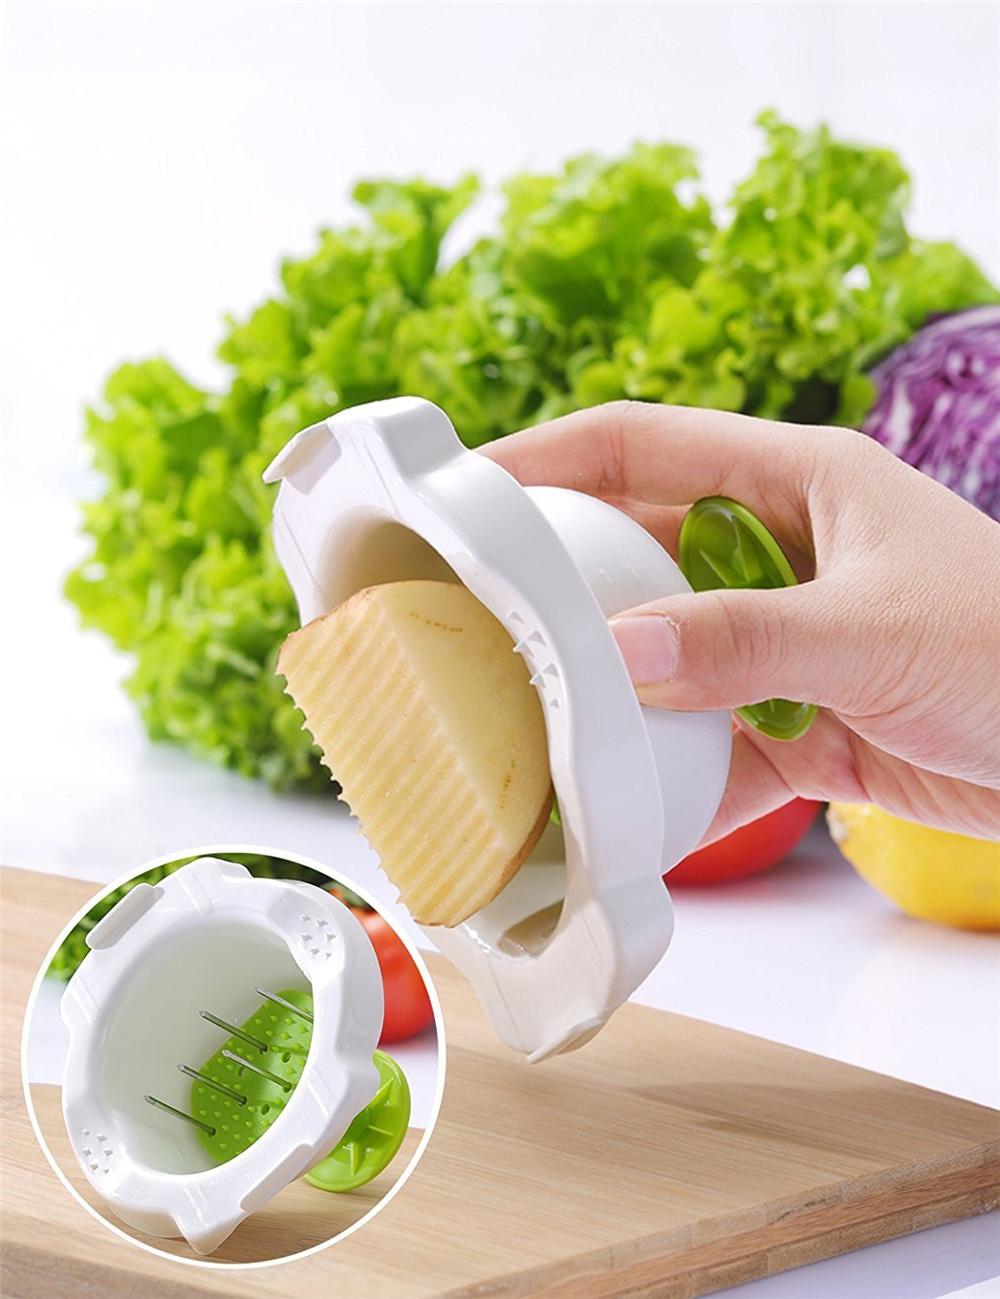 Mandoline Peeler Grater Vegetables Cutter tools with 5 Blade Carrot Grater Onion Vegetable Slicer Kitchen Accessories15